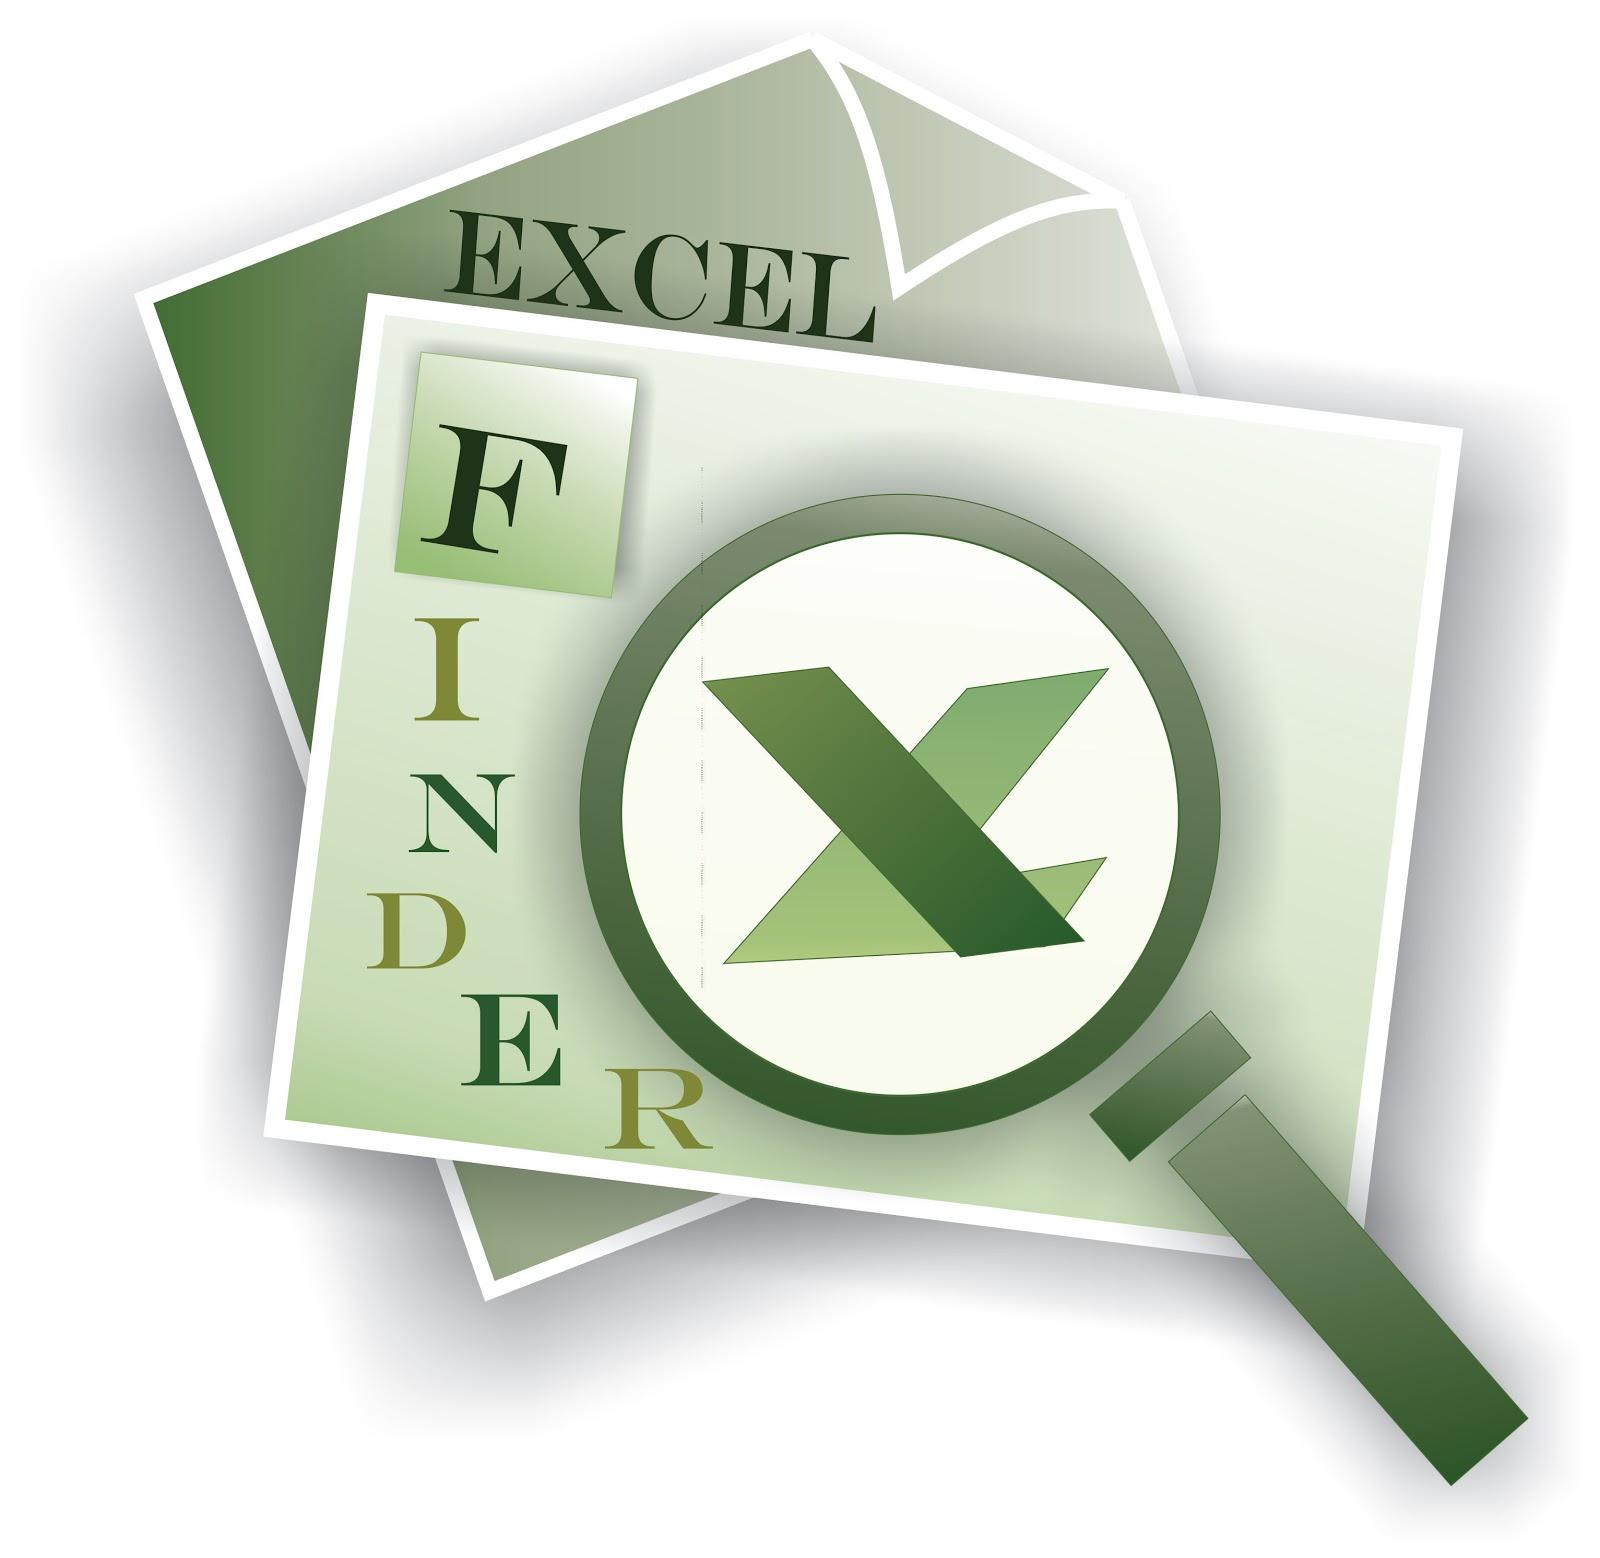 Excelfinder